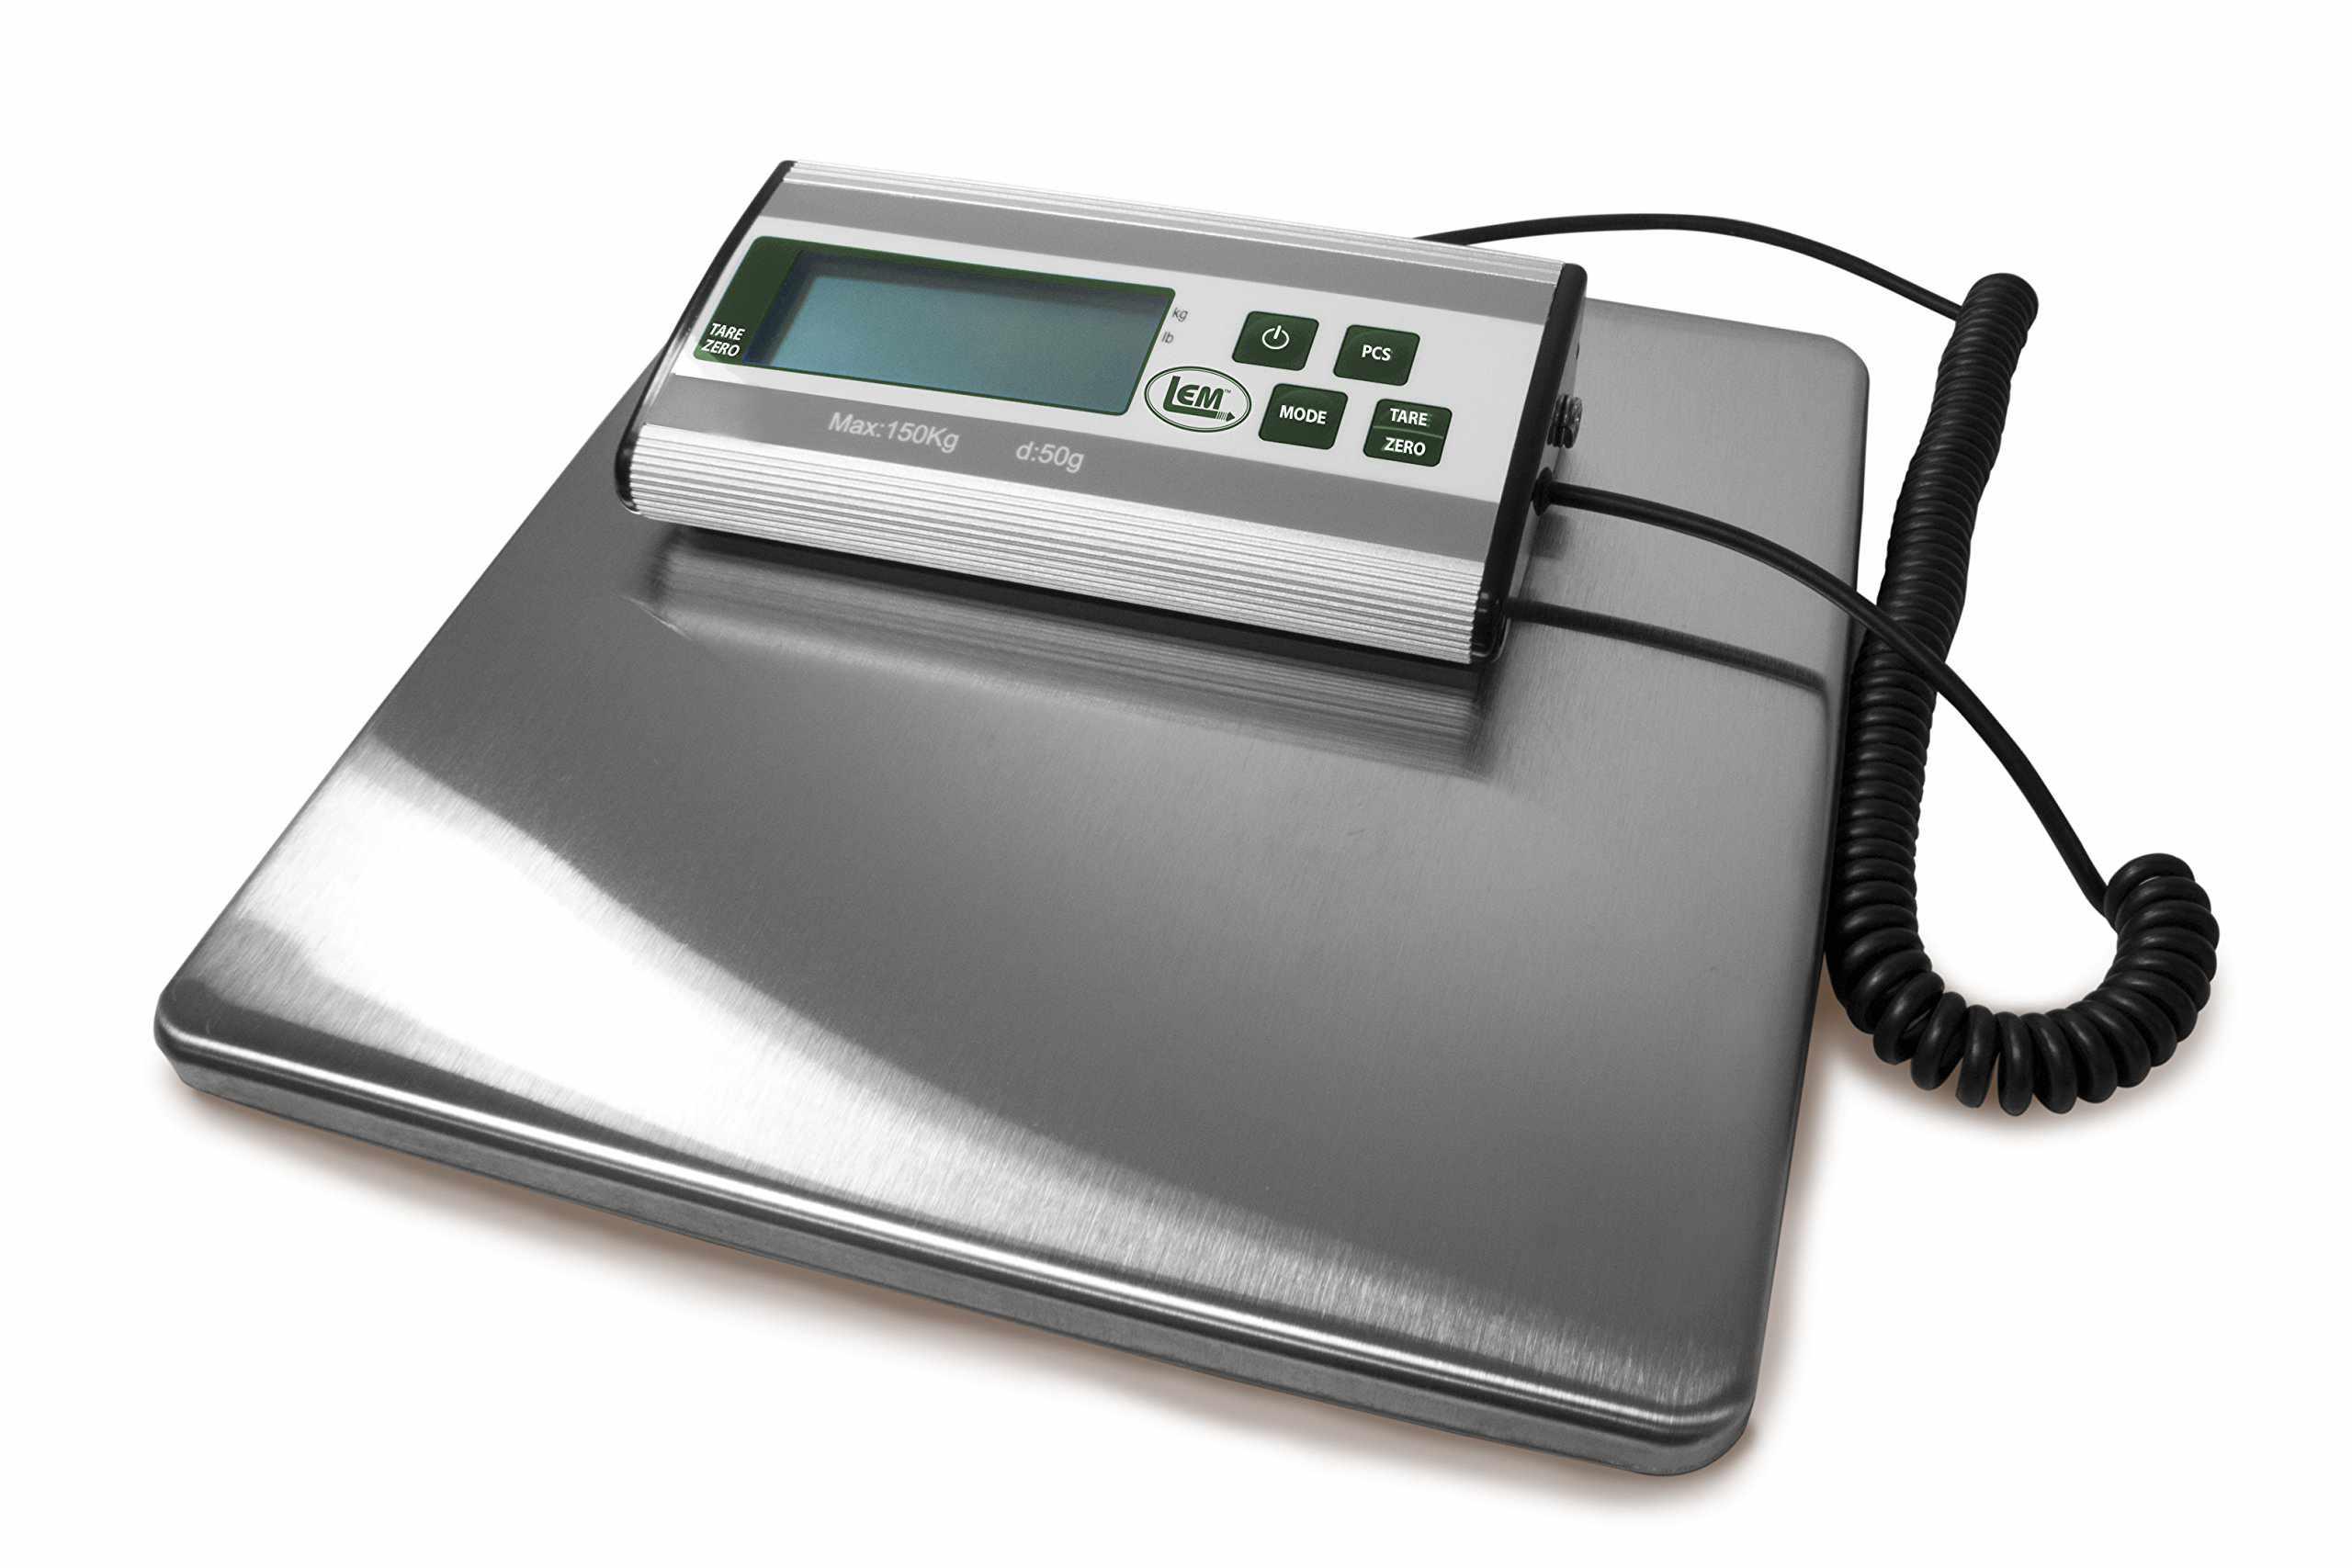 LEM 330 lb. Stainless Steel Digital Scale